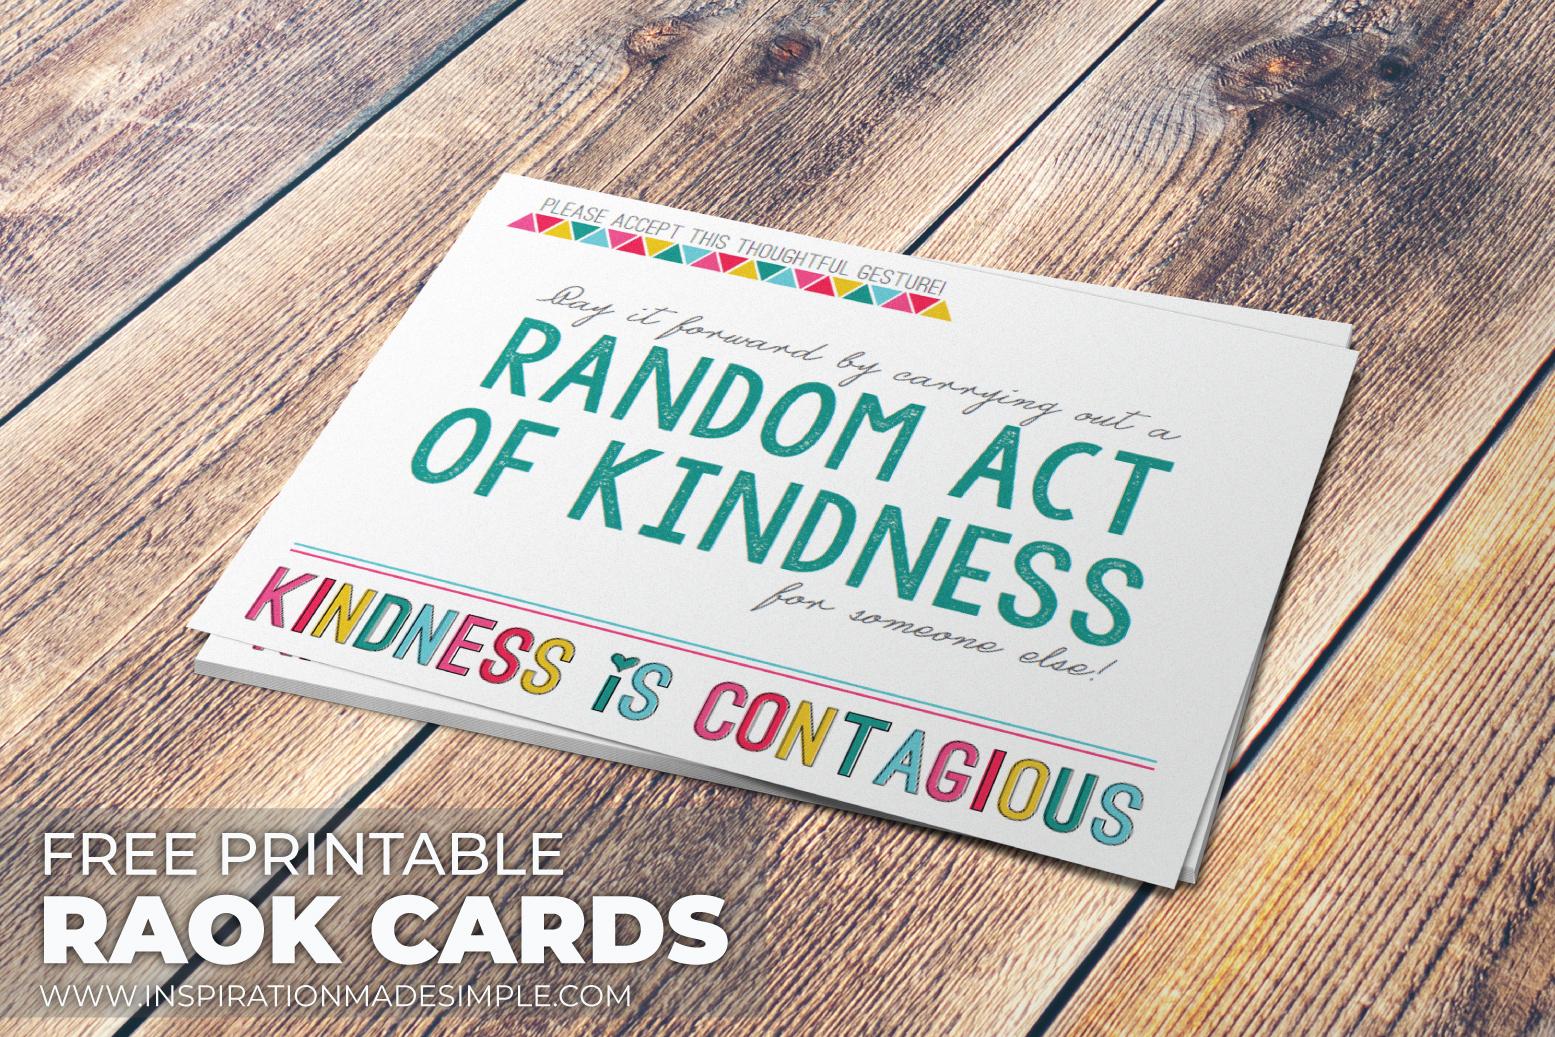 Free Printable Random Acts of Kindness Cardsards